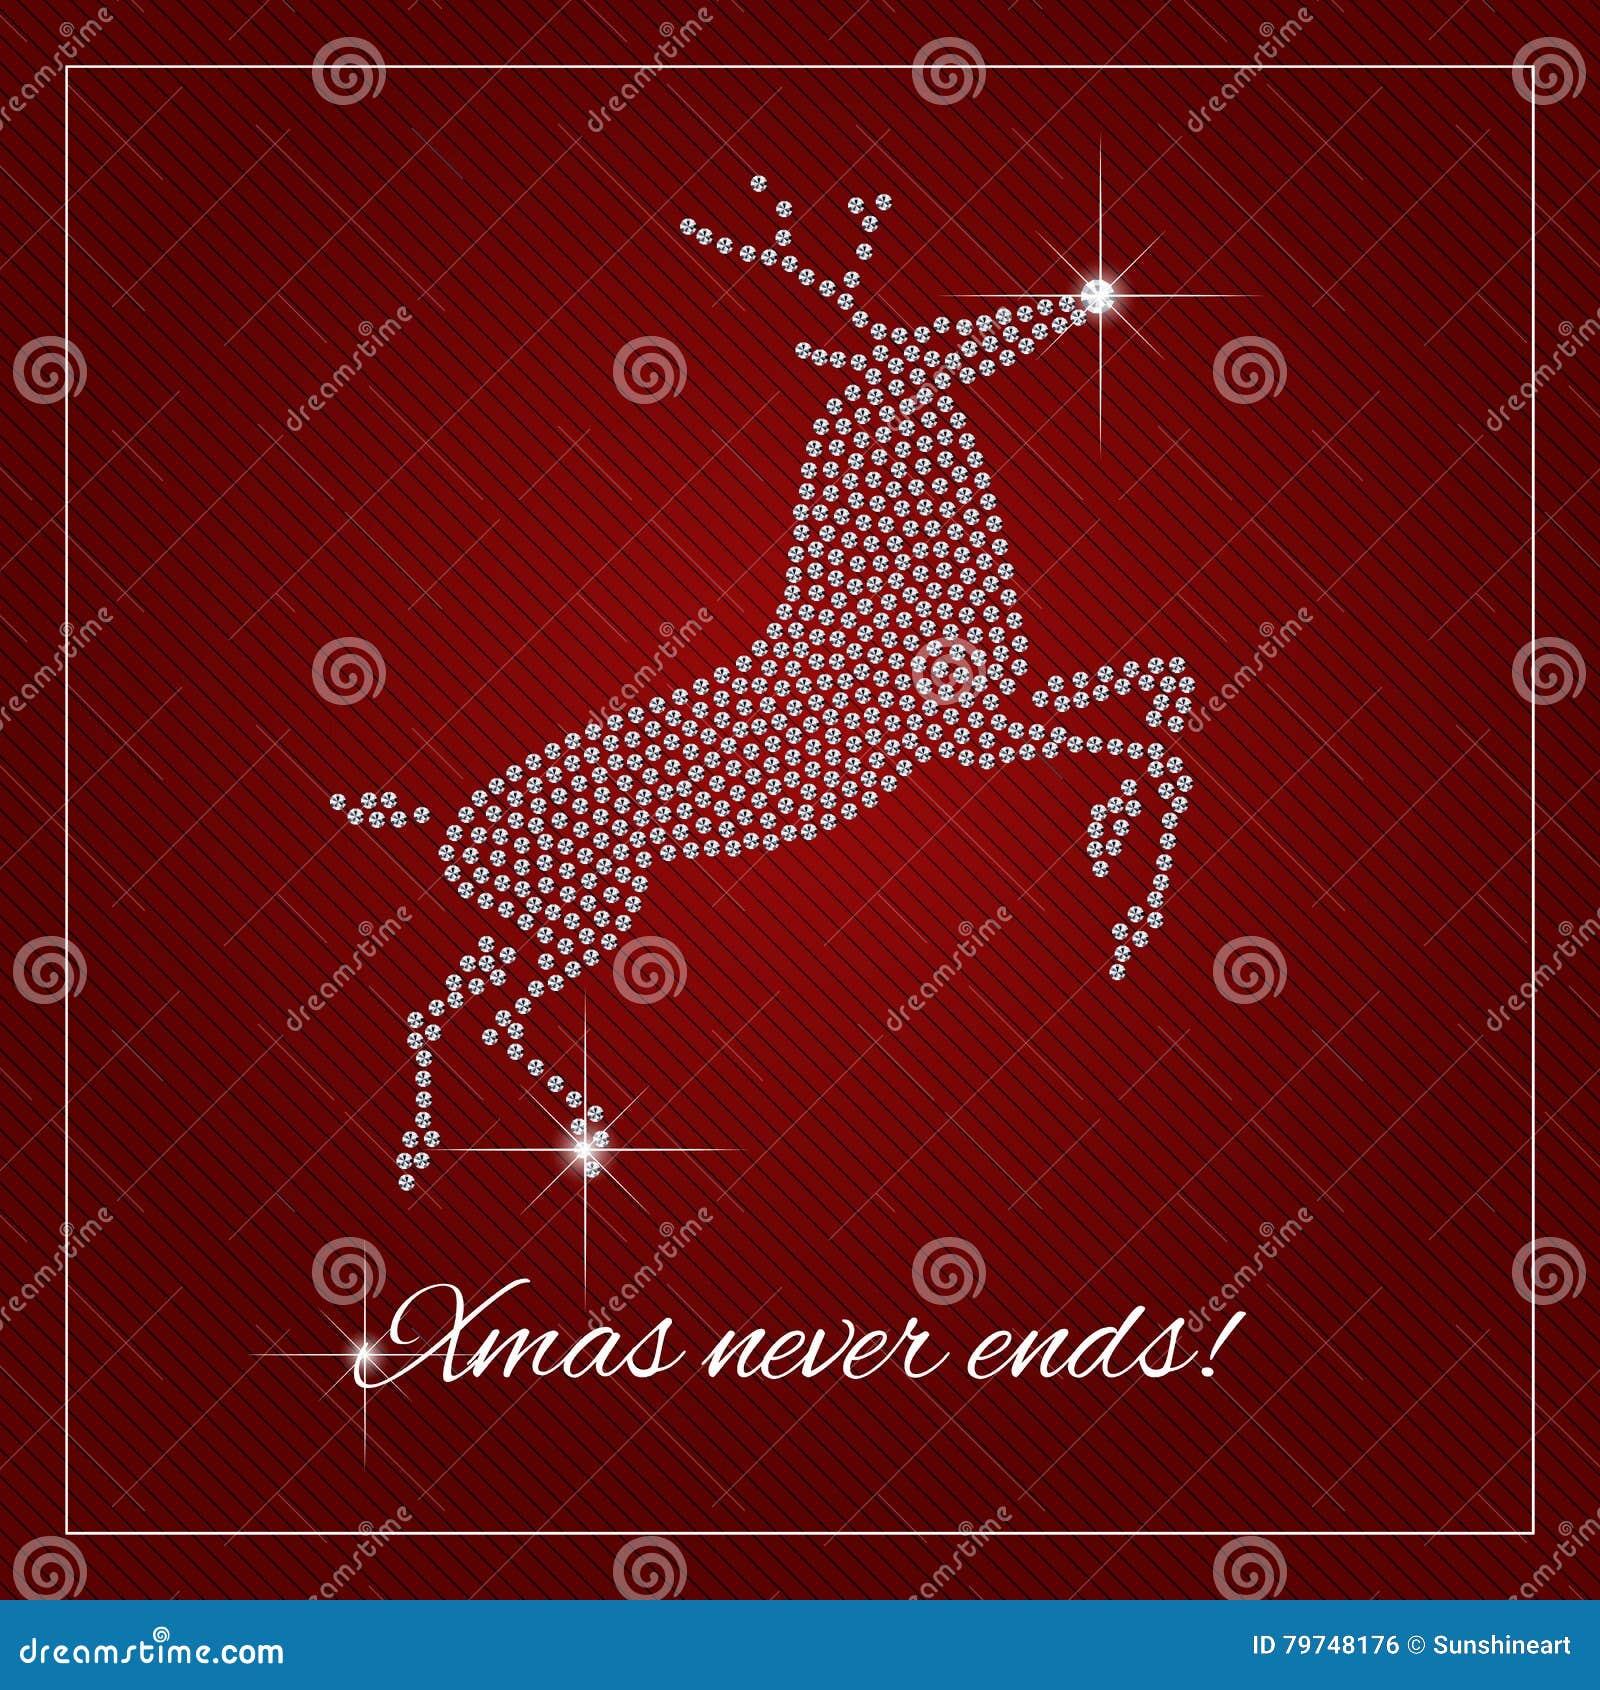 rhinestone holiday season template stock vector image 79748176 rhinestone holiday season template